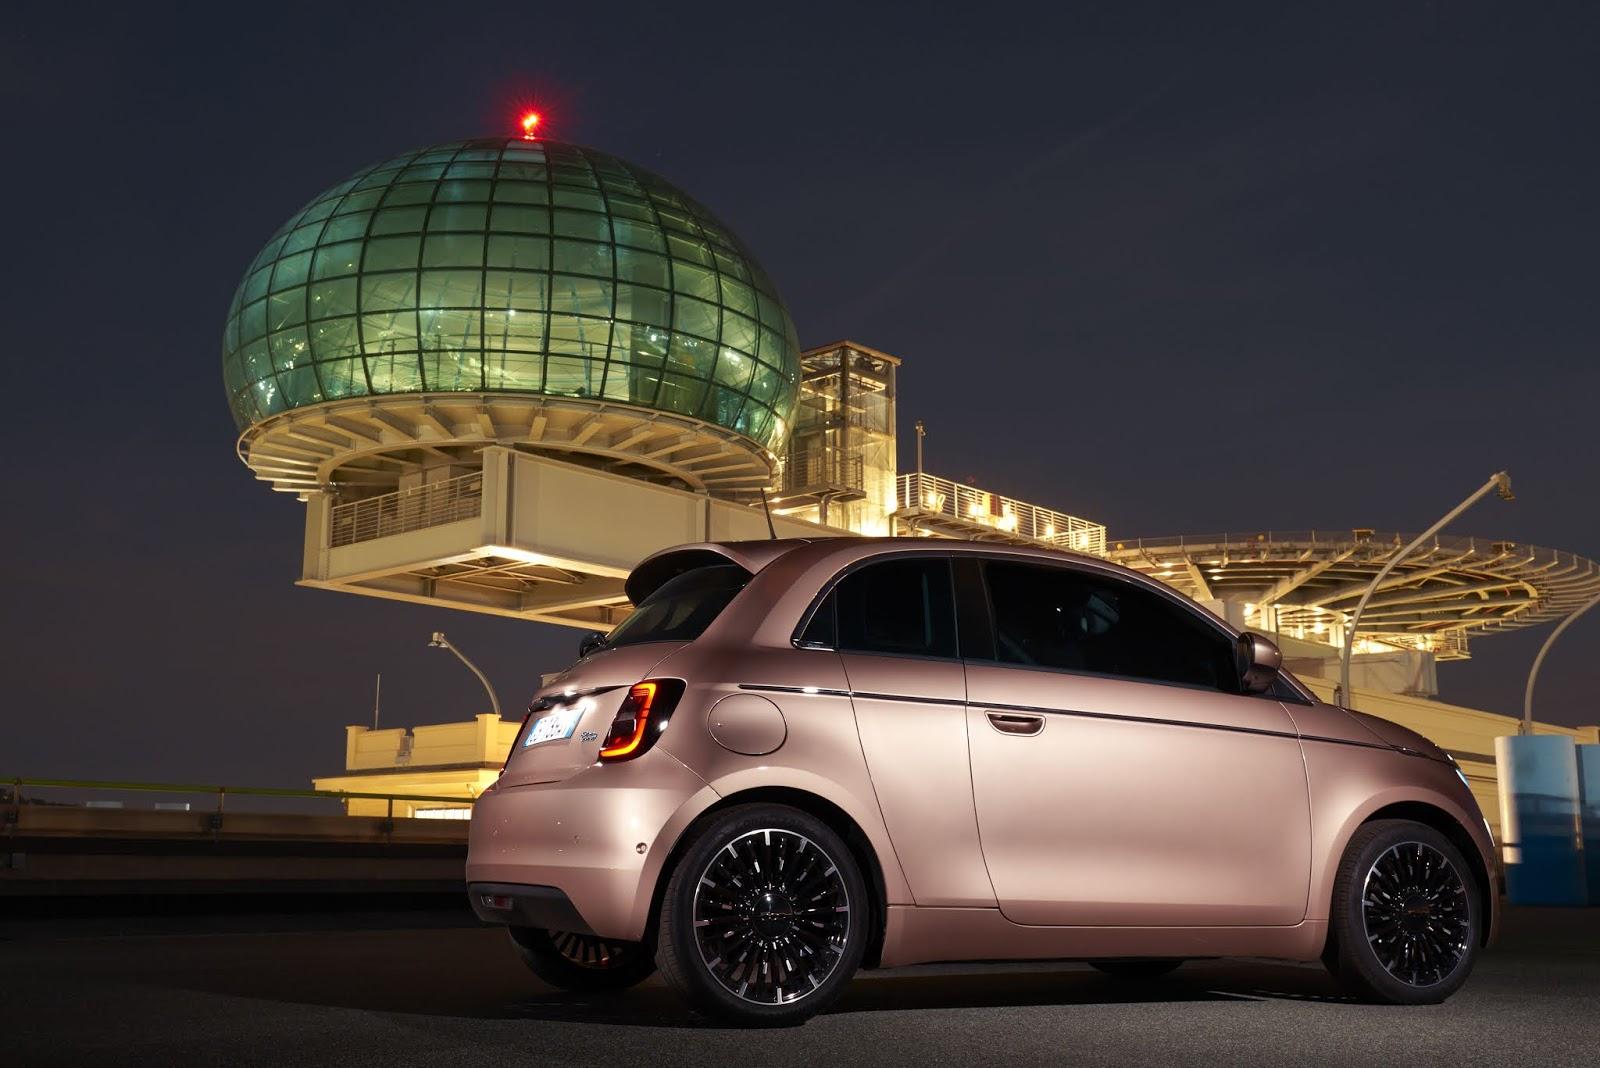 01 New2B500 Νέο Fiat 500: Ηλεκτρικό, προηγμένο και με τιμή κάτω των 20.000* ευρώ στην Ελλάδα!